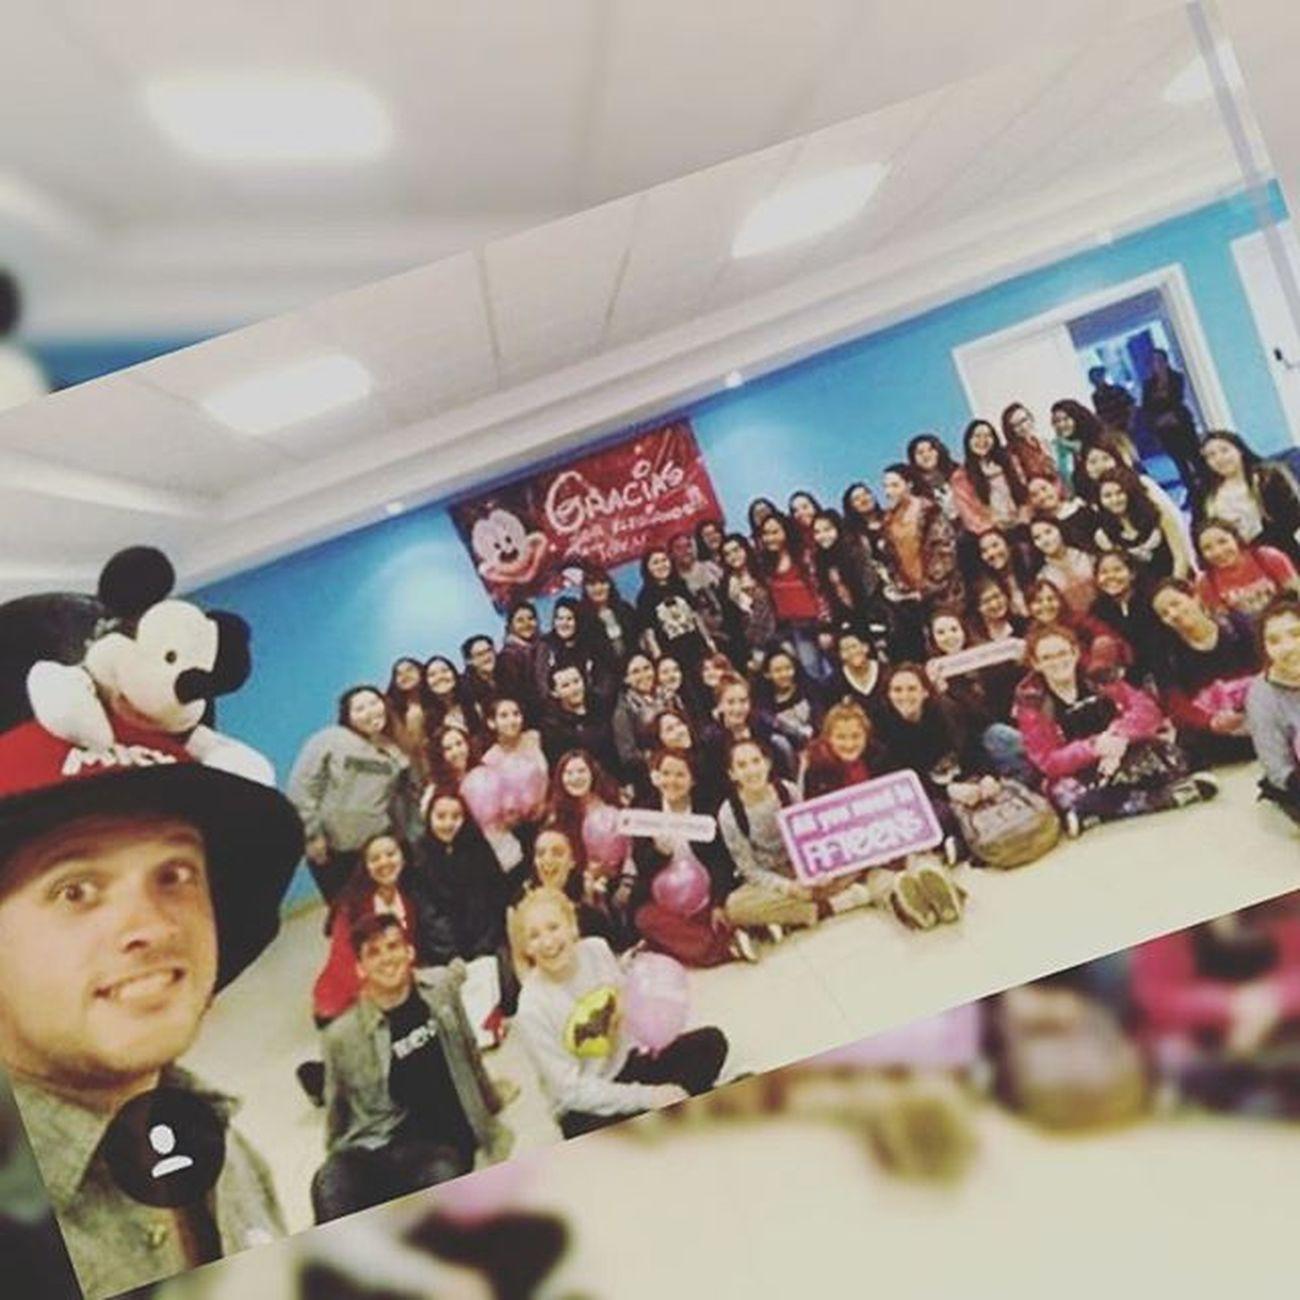 @fifteens15 @maximilianomir @jeroprassel Riogrande Yaganes Reunion  Fifteens Tolkar Disney2017